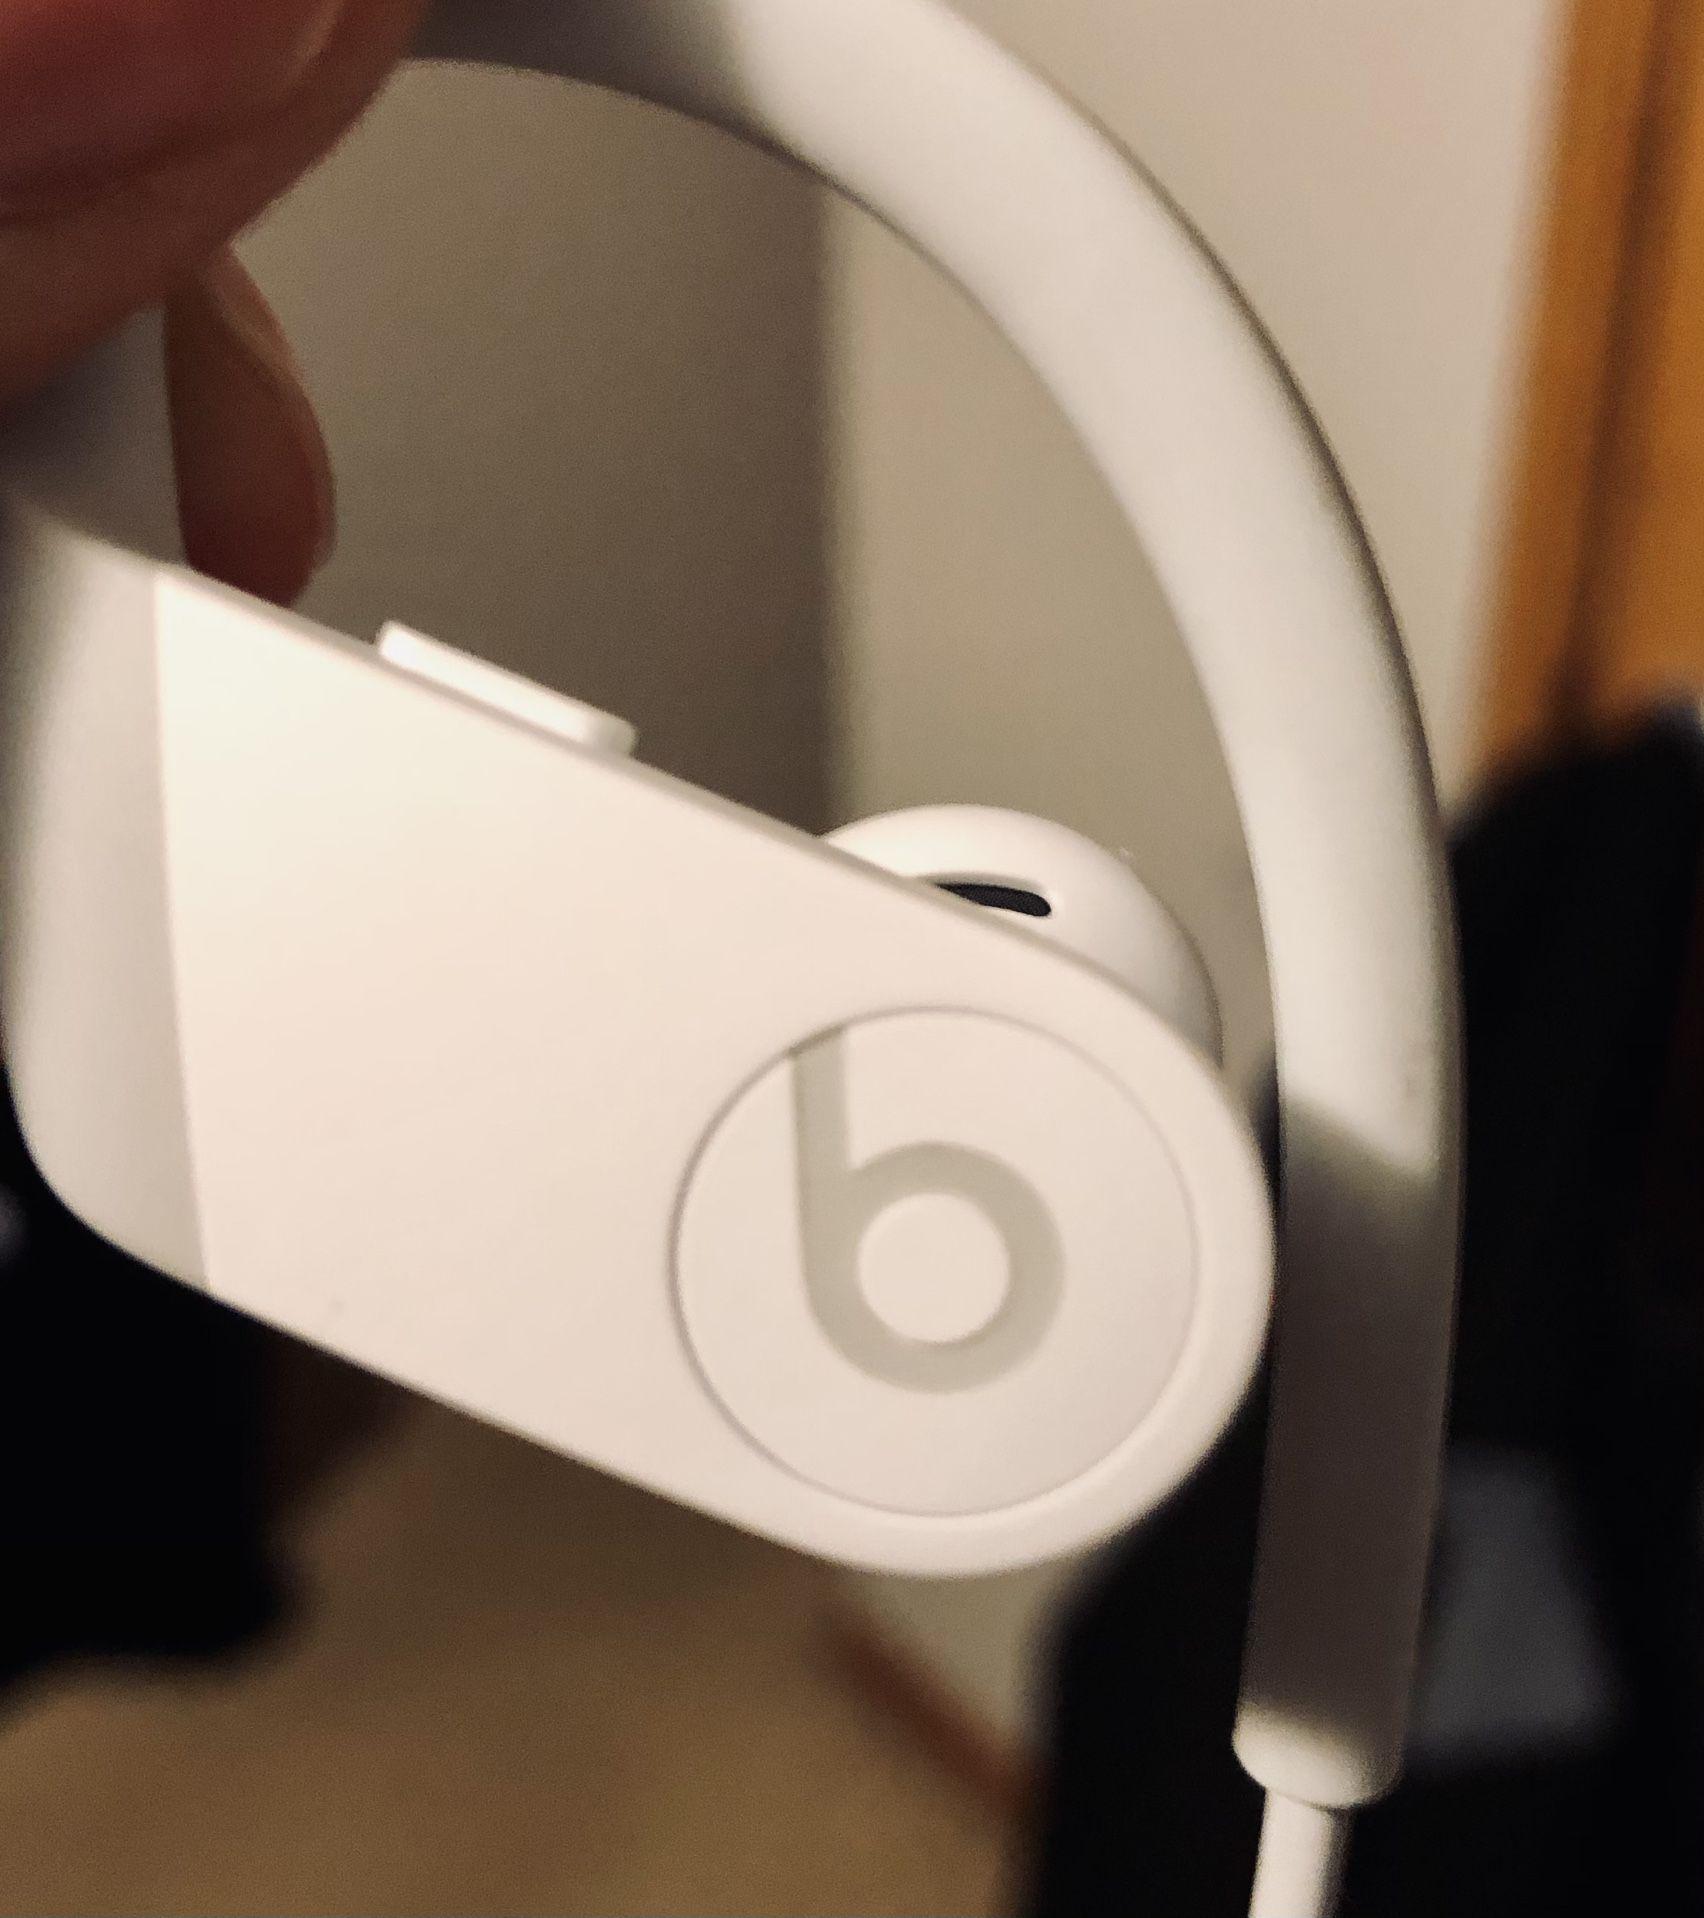 Apple Beats Powerbeats High-performance